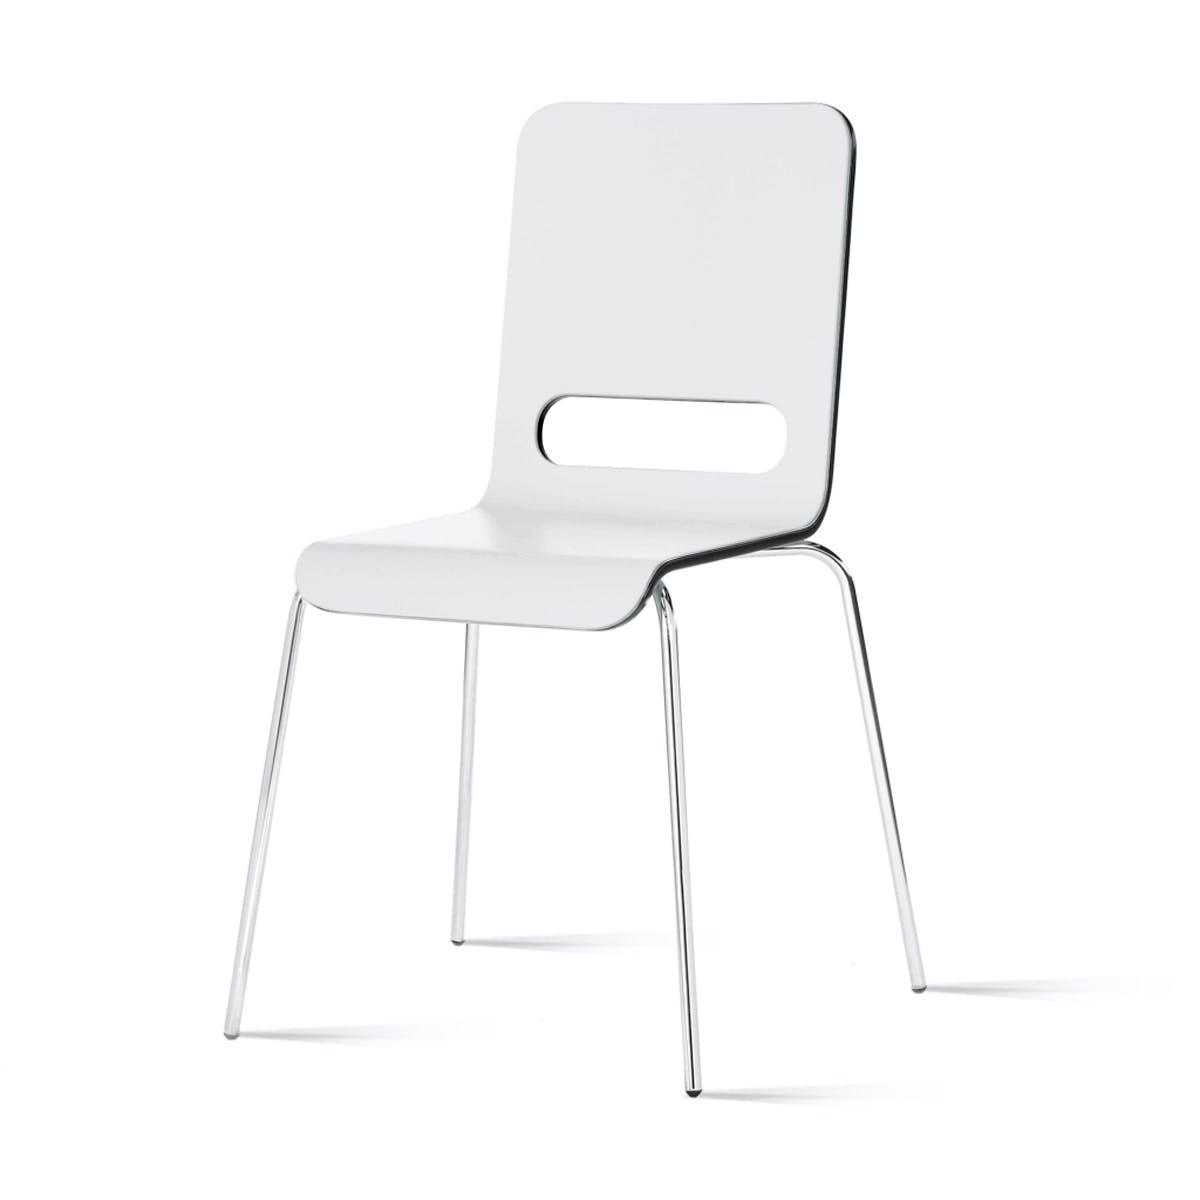 Deadgood-form-chair-left-haute-living